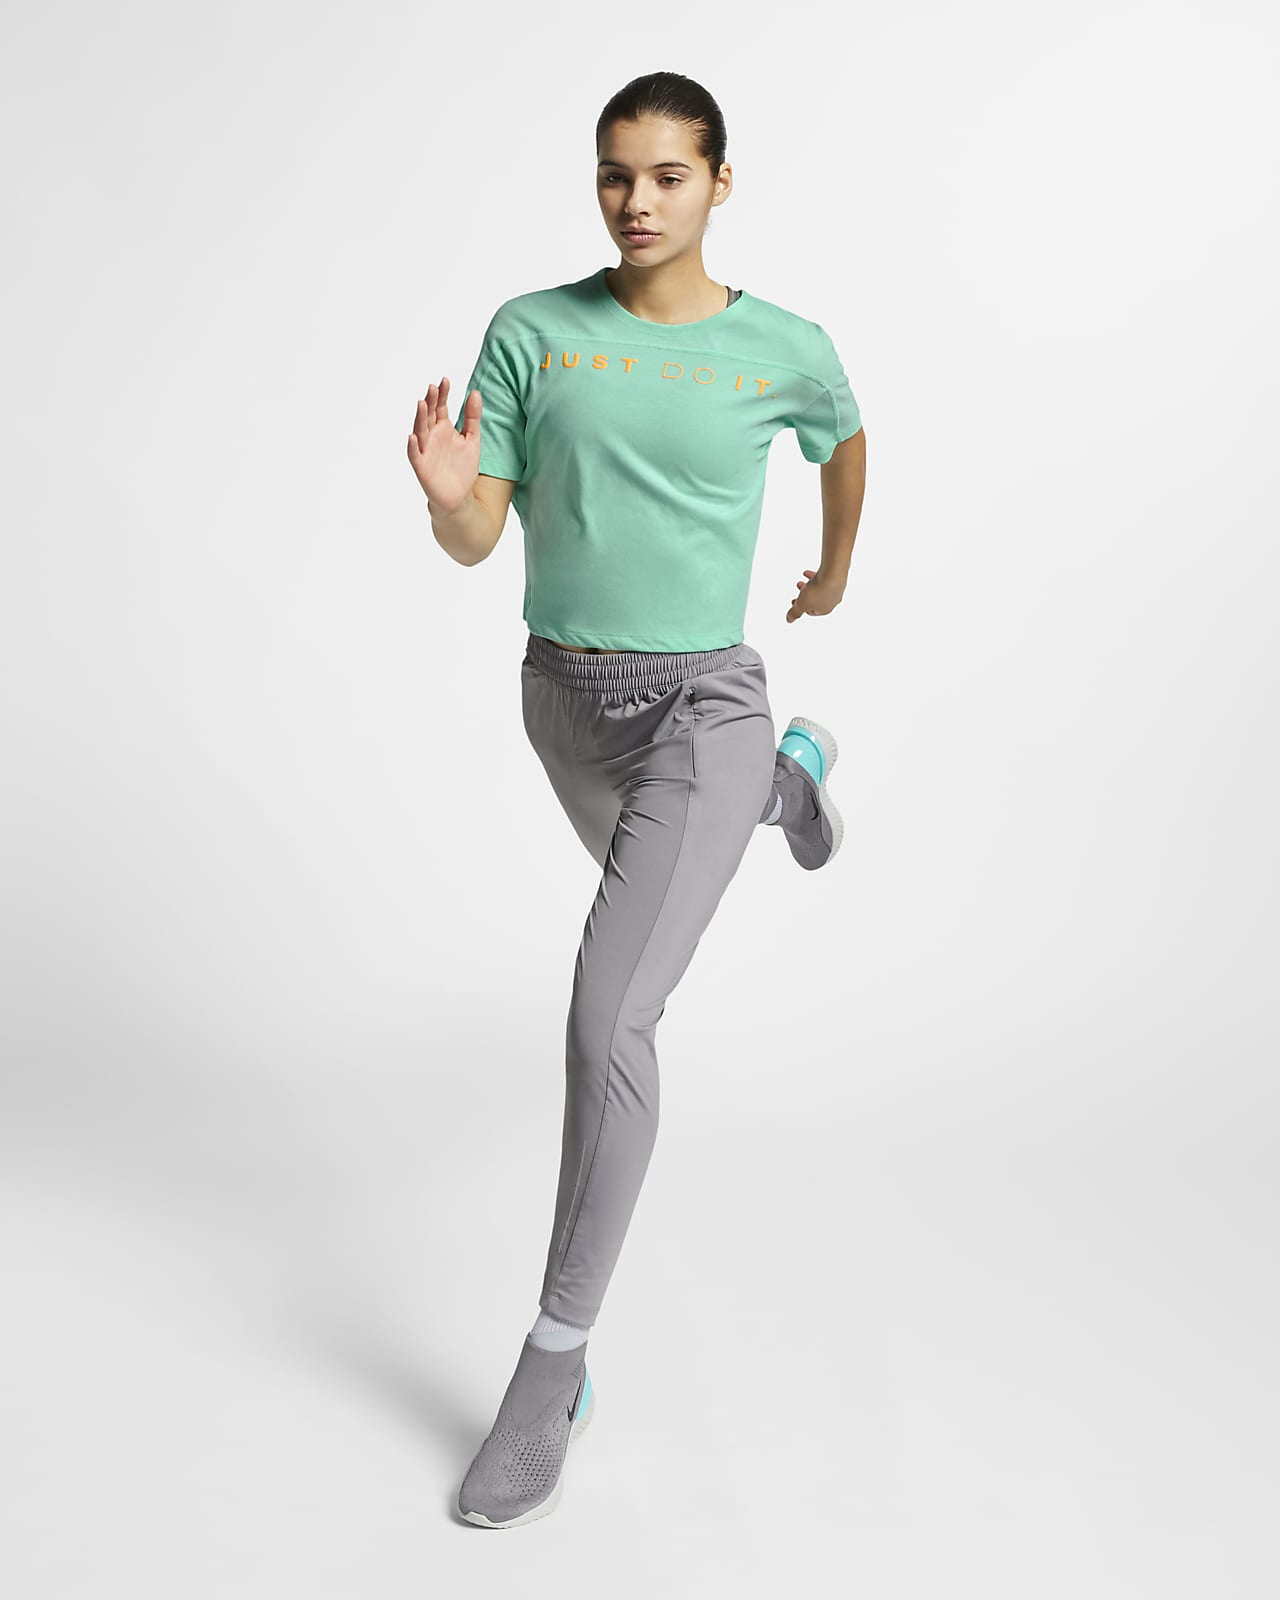 Nike Dri-FIT Miler Women's Short-Sleeve